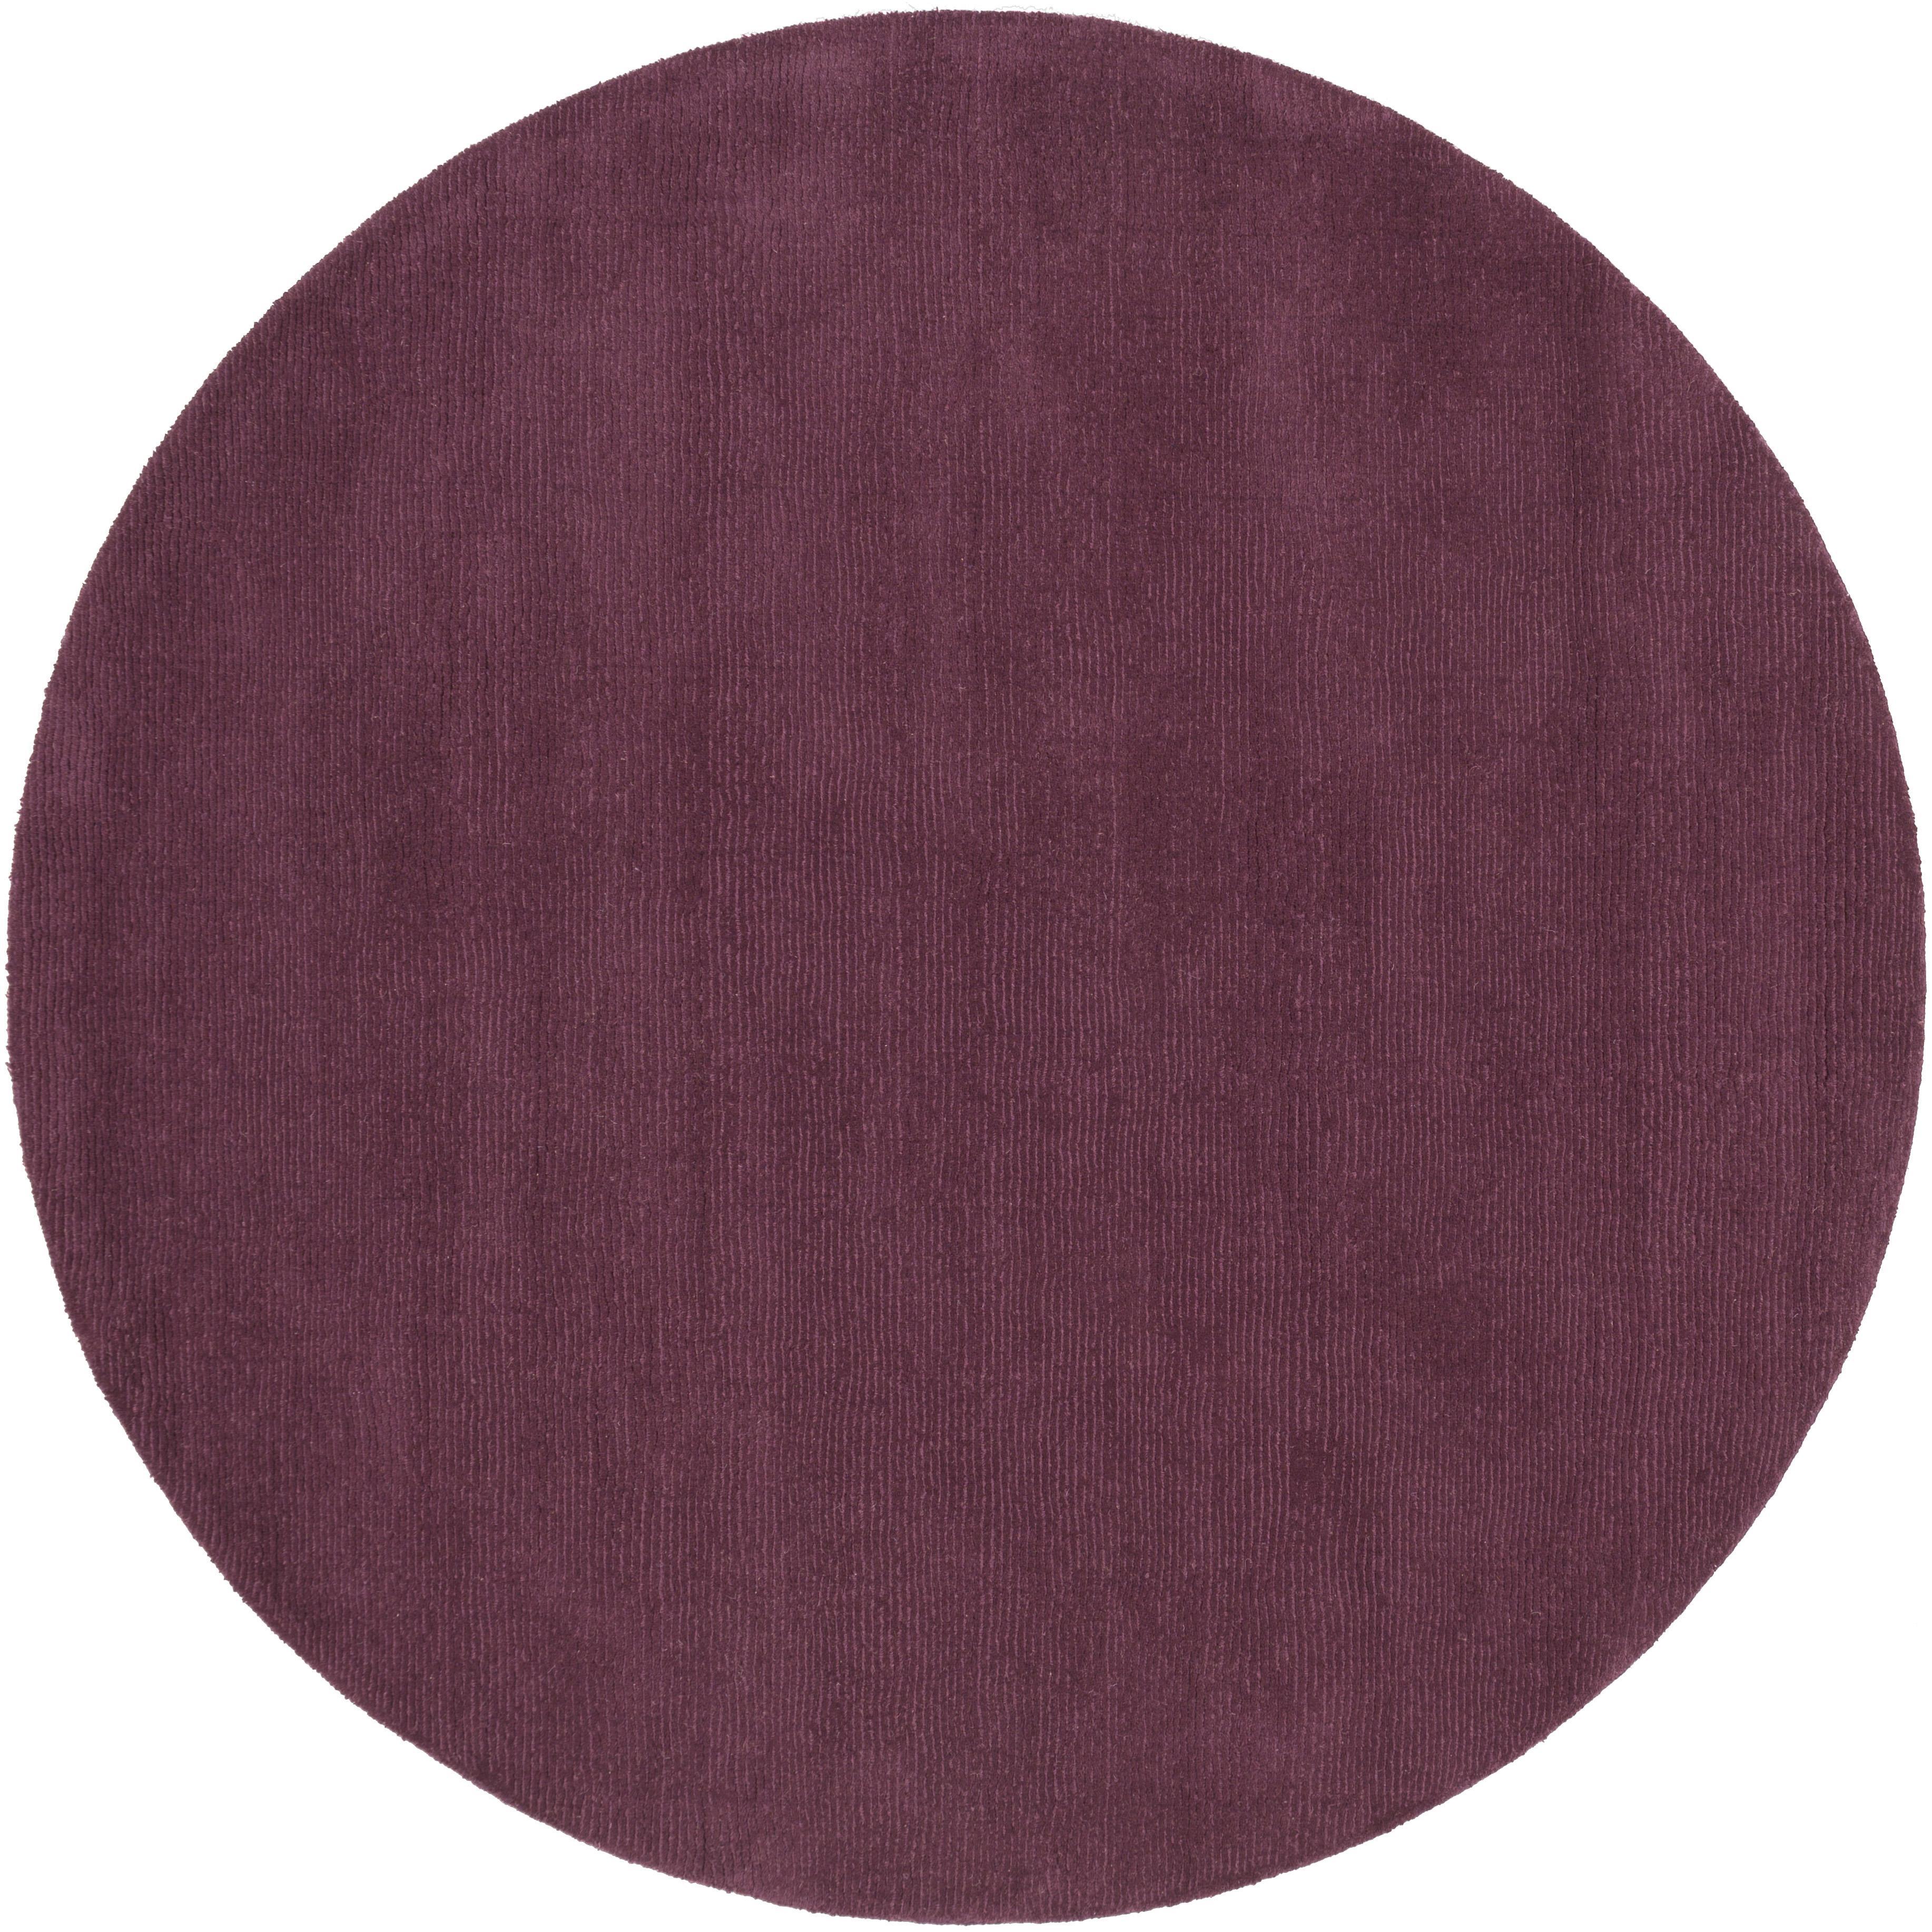 Surya Rugs Mystique 8' Round - Item Number: M5326-8RD